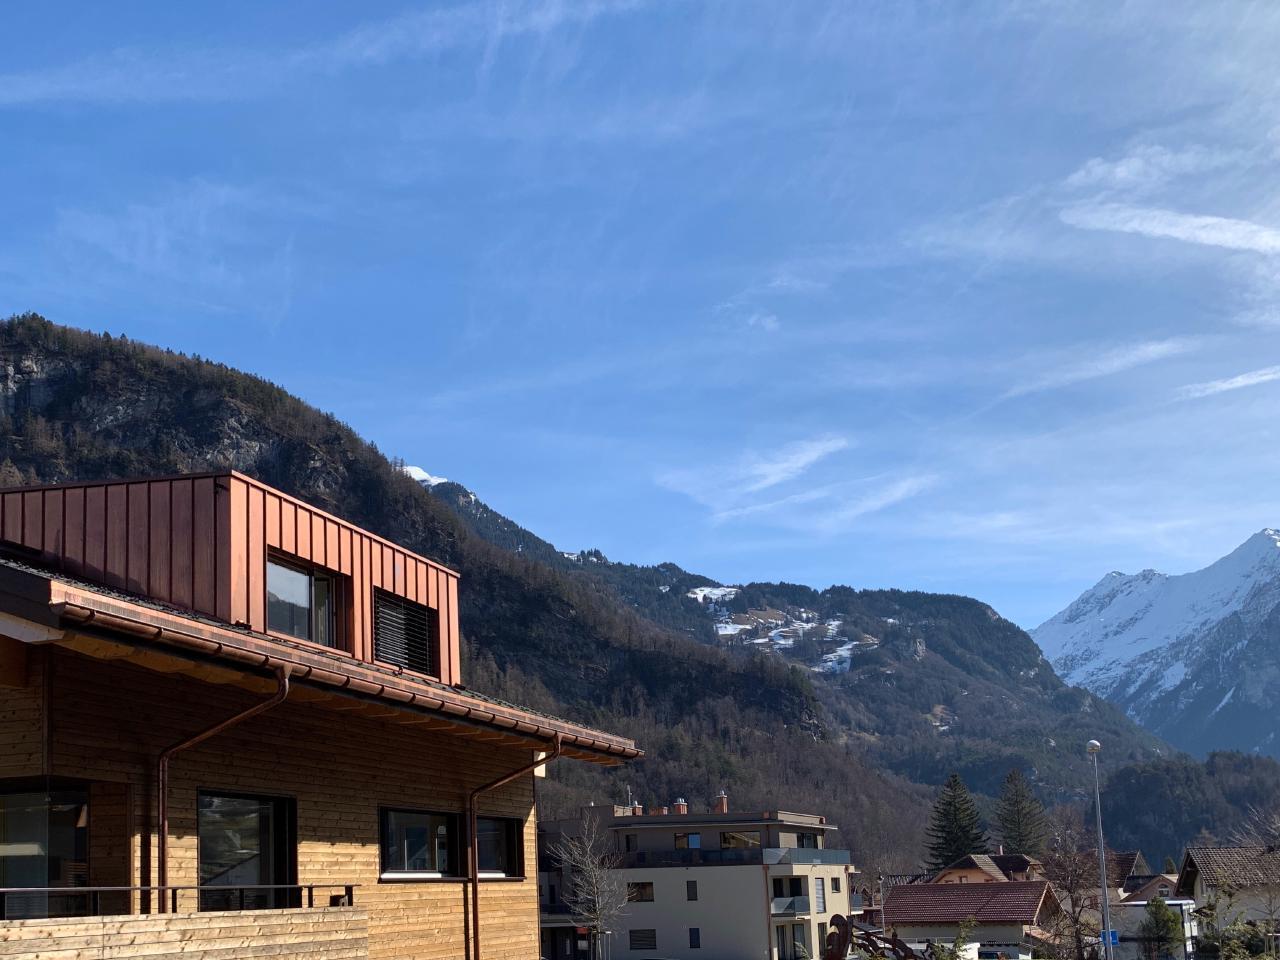 Ferienwohnung Mountain 4U (2605720), Meiringen, Meiringen - Hasliberg, Berner Oberland, Schweiz, Bild 19